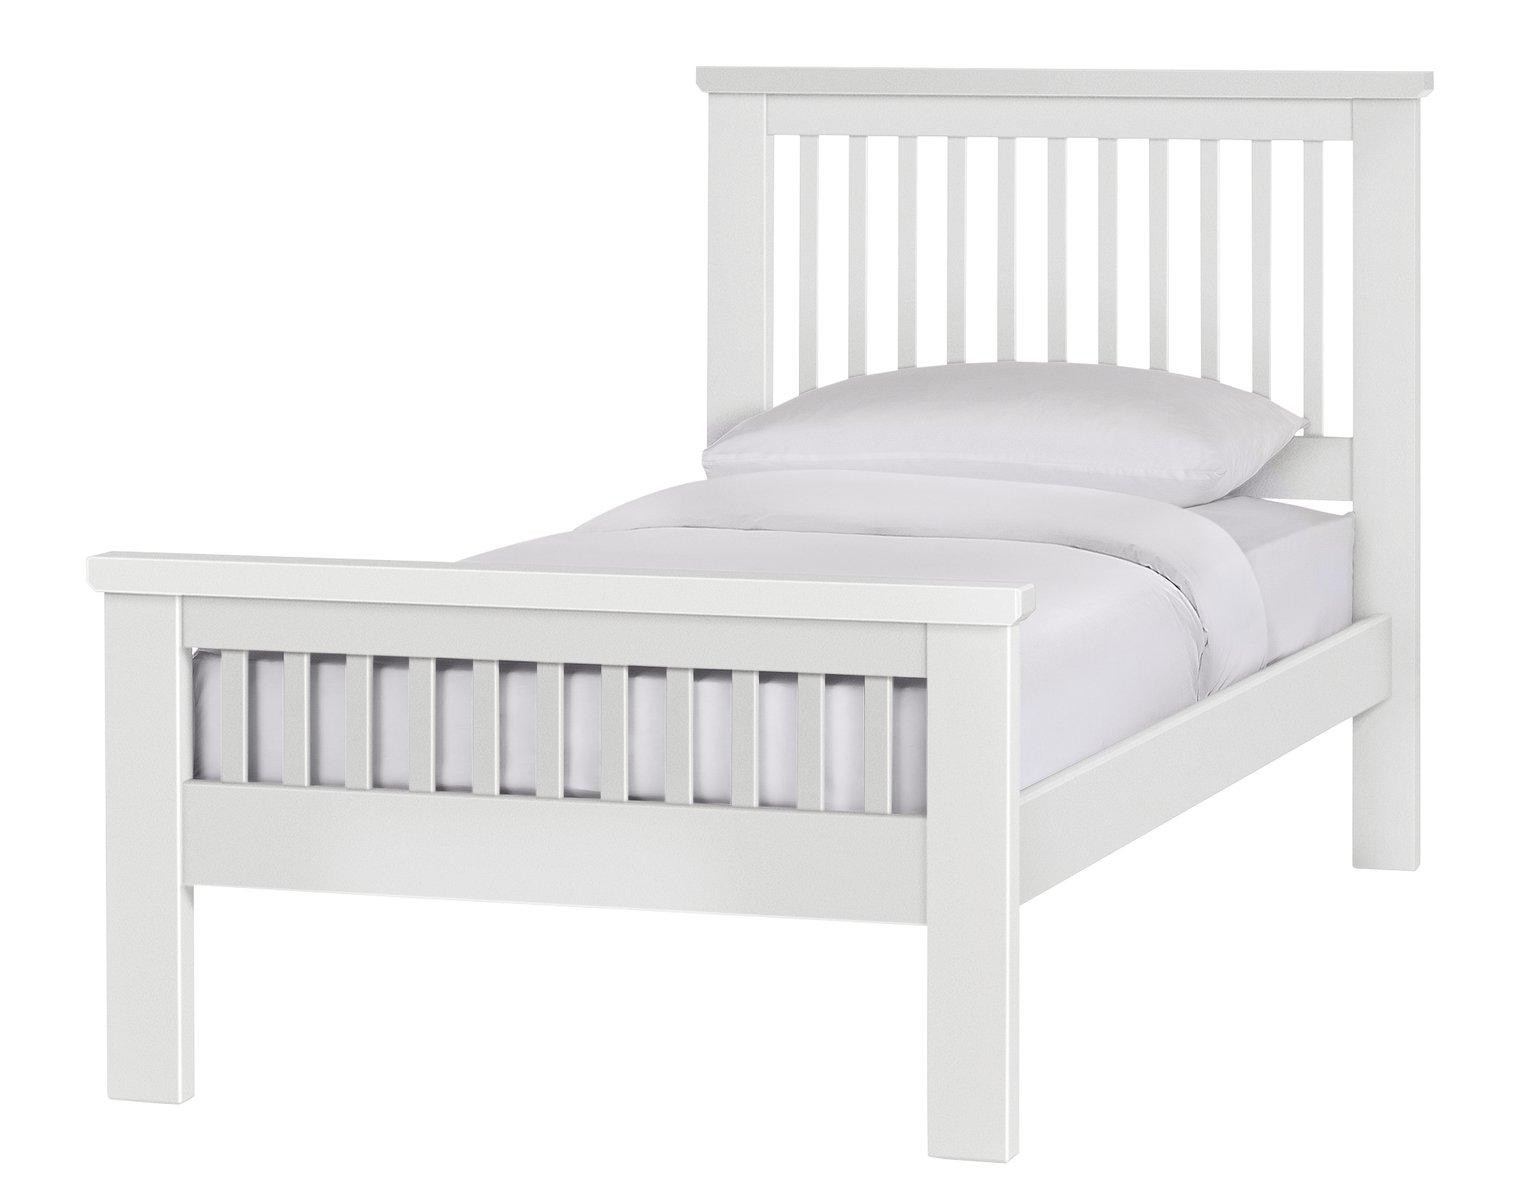 Argos Home Aubrey Single Bed Frame - White